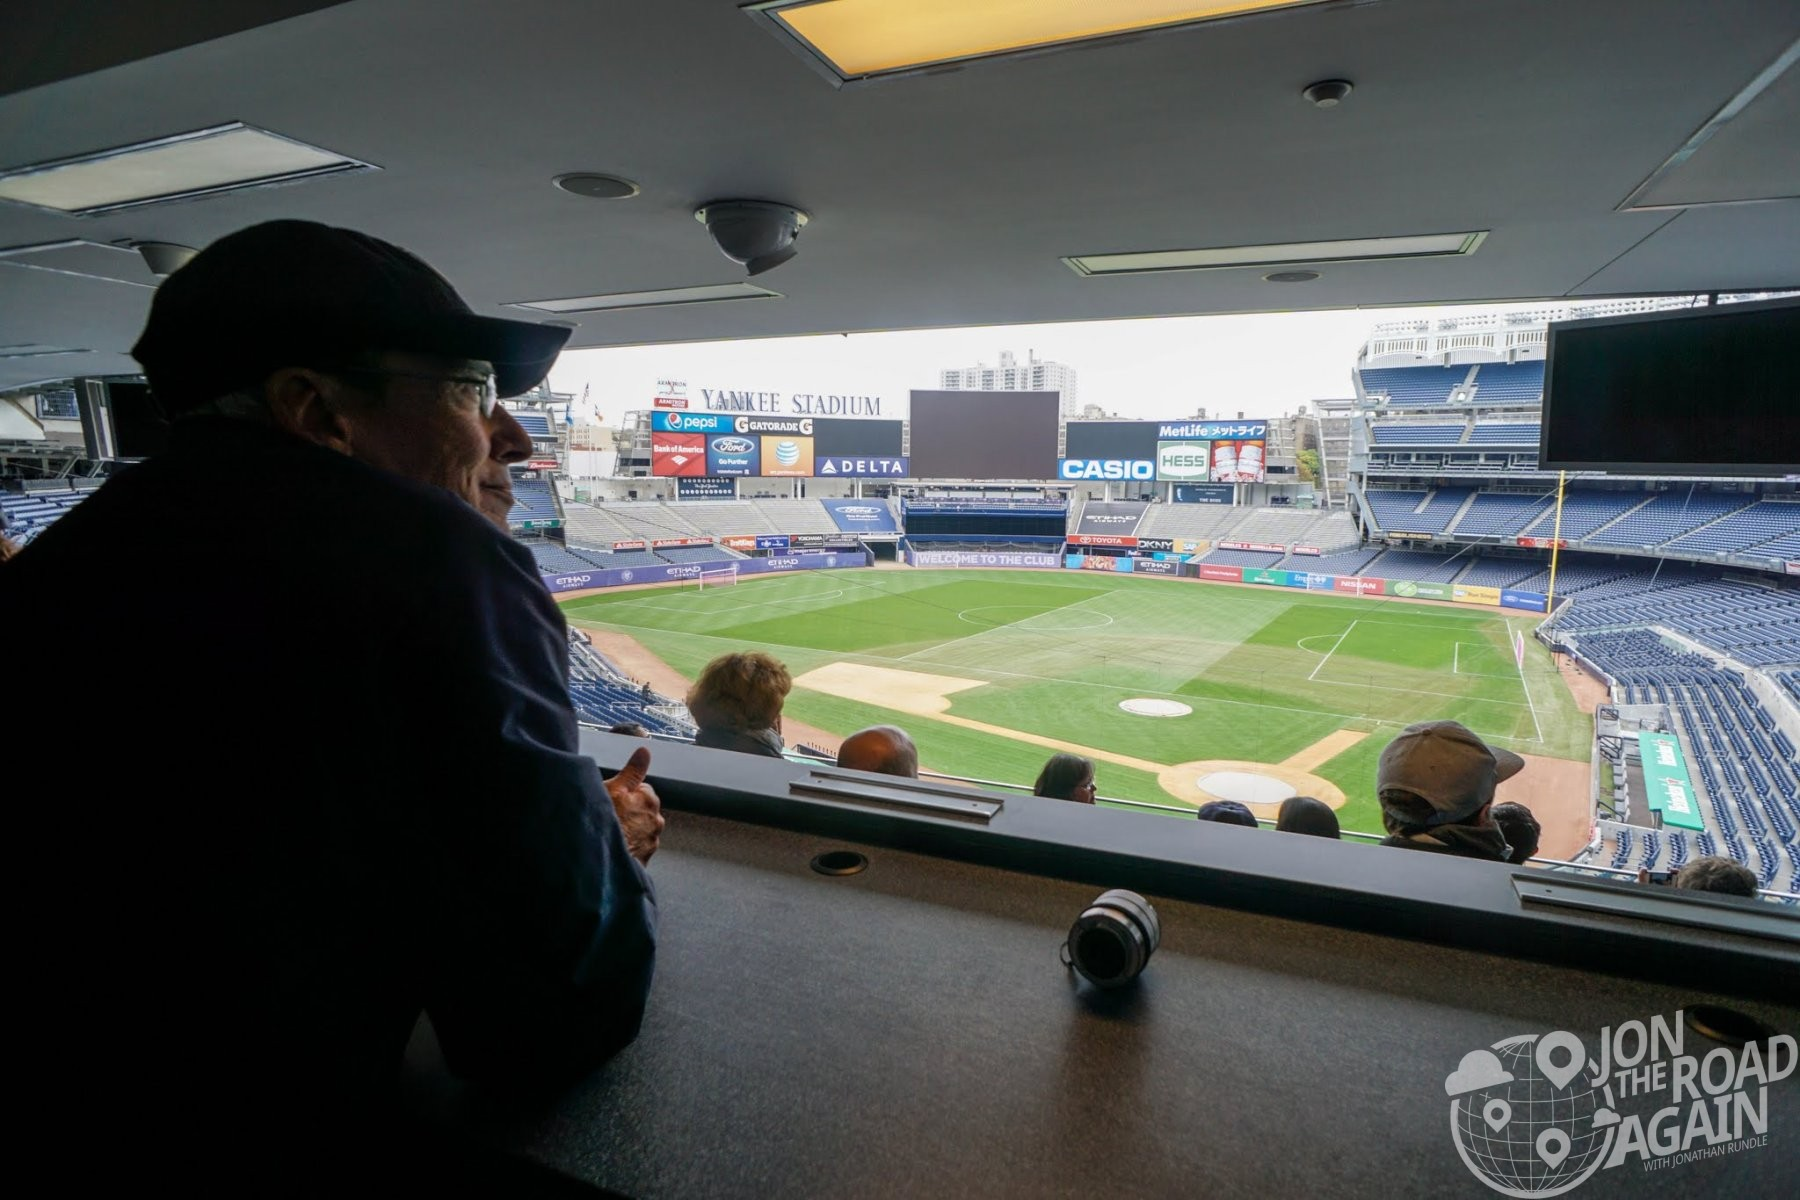 View from the Press Box at Yankee Stadium